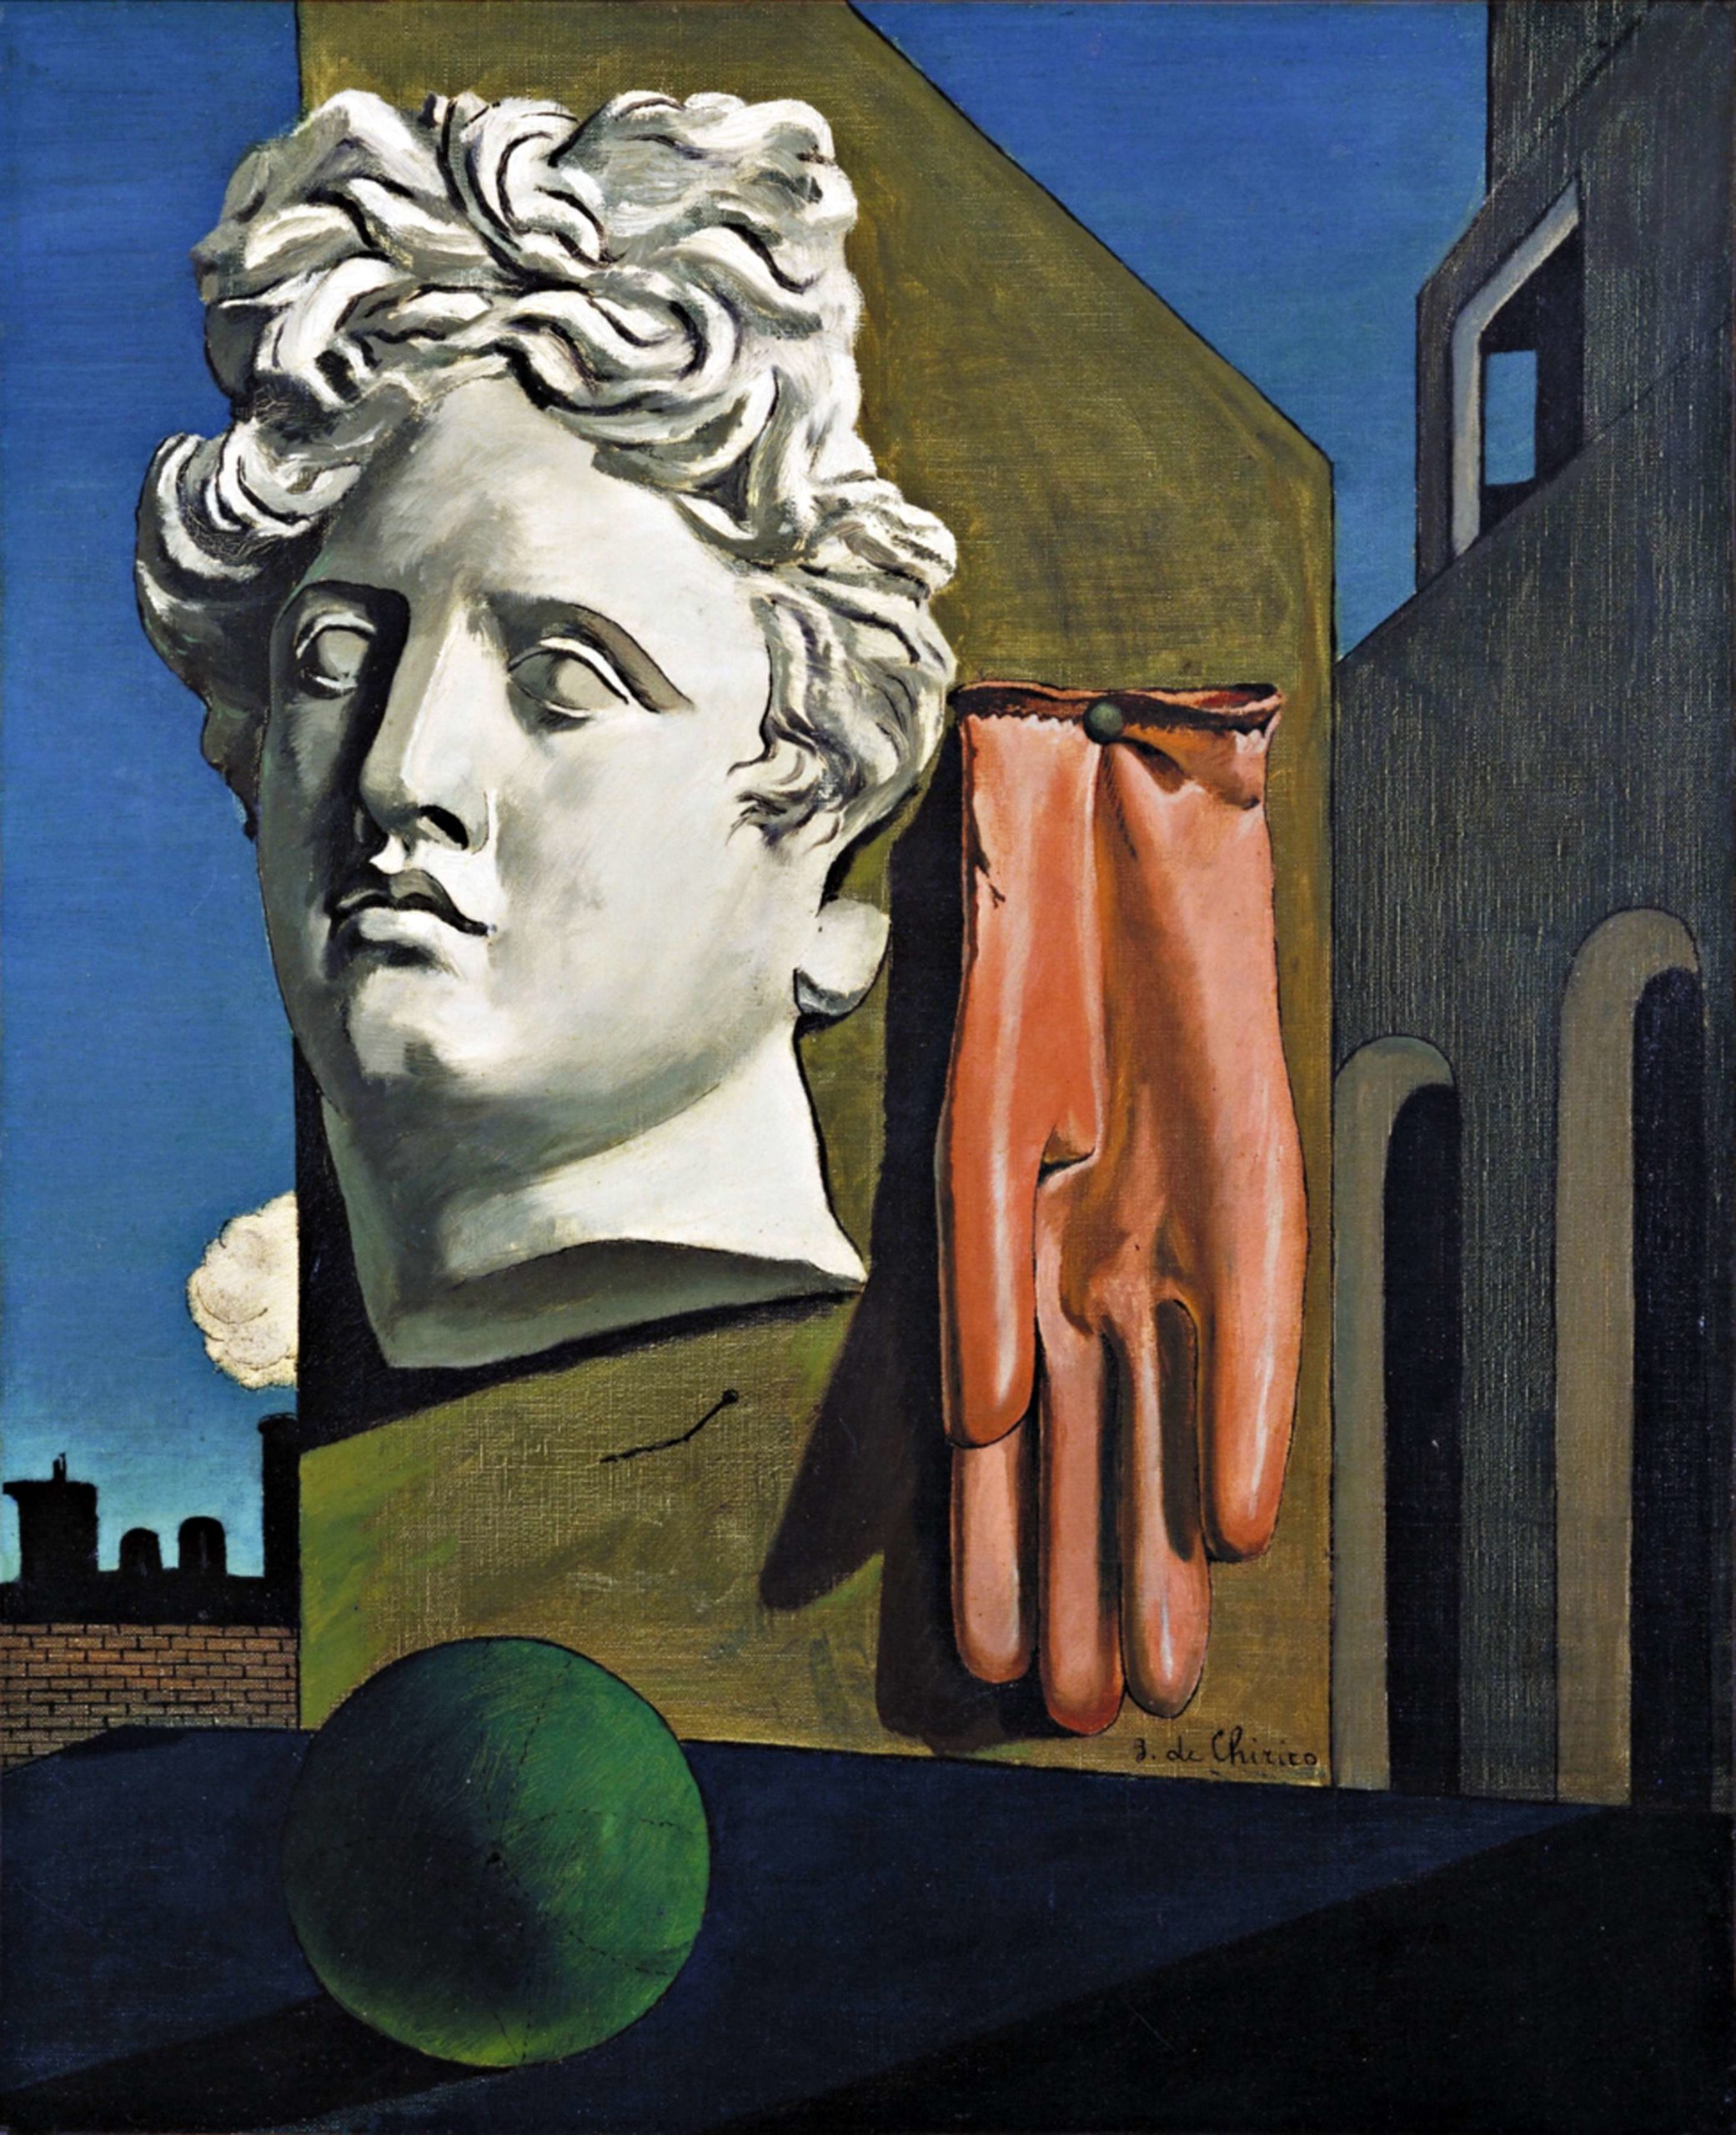 Canto d'amore di Giorgio de Chirico (1914, New York, The Museum of Modern Art) a cura di Riccardo Dottori